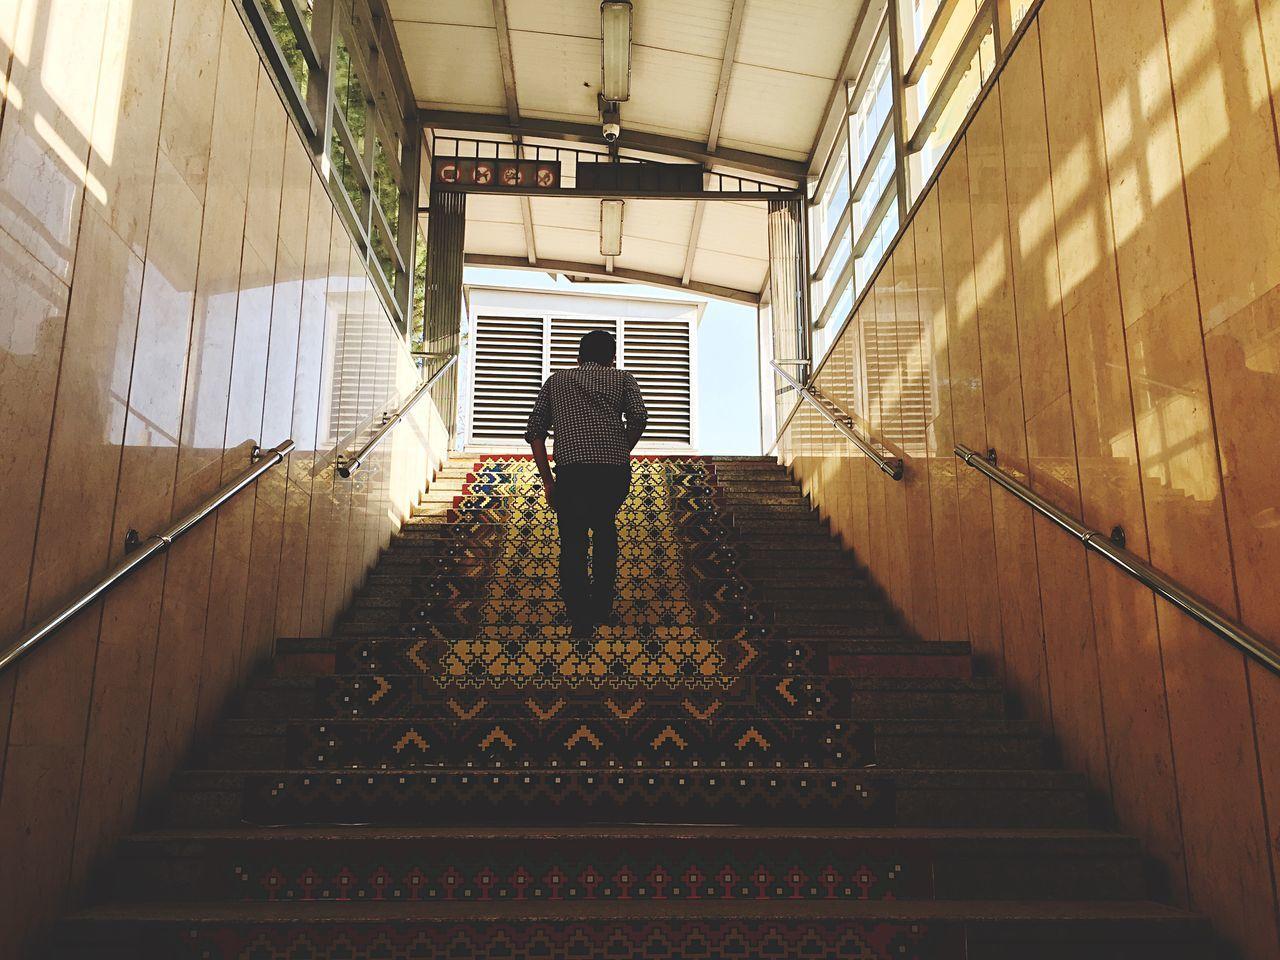 Rear view of man walking on steps